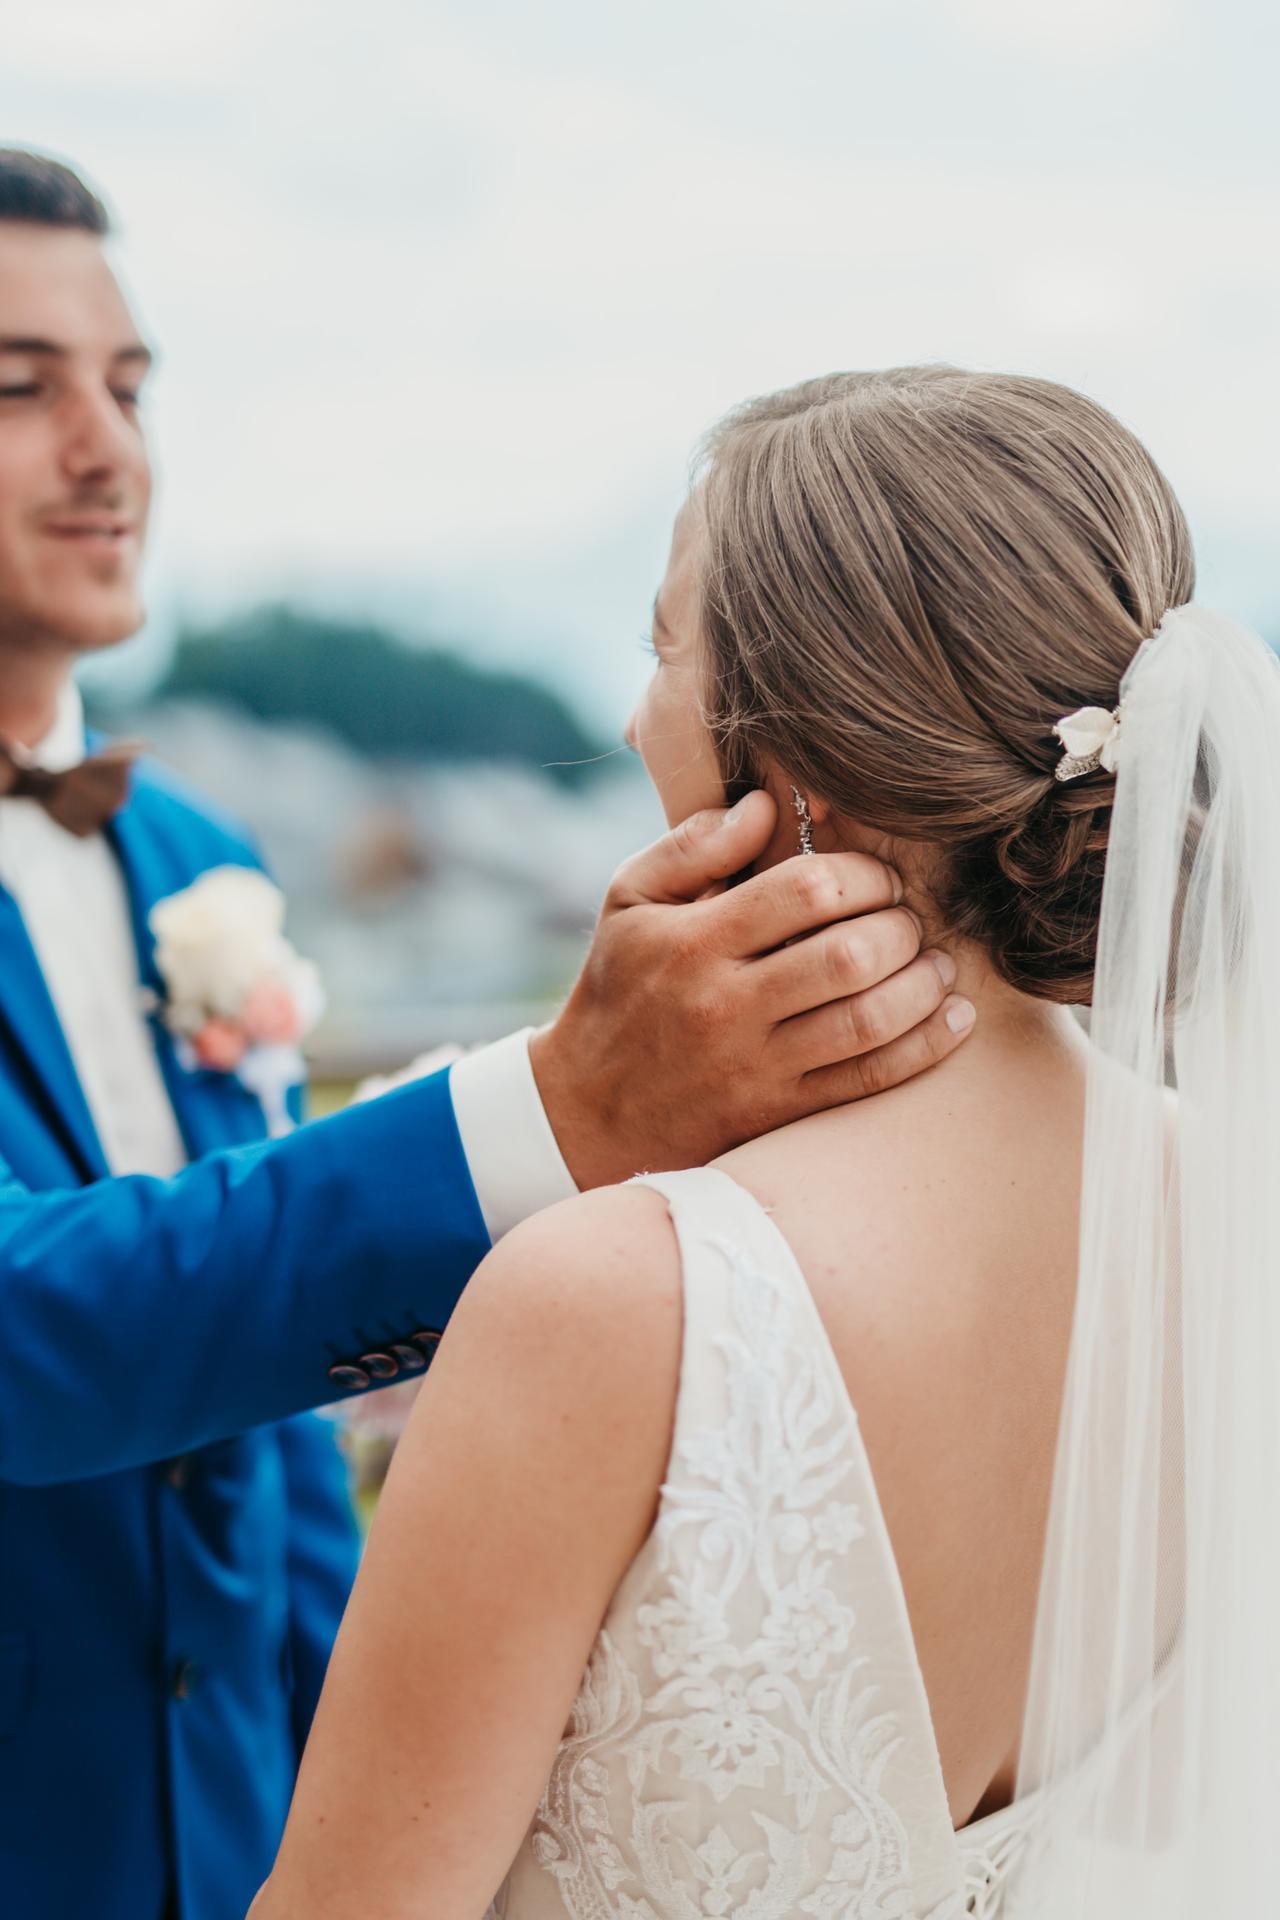 Our wedding ❤️ - Obrázok č. 10